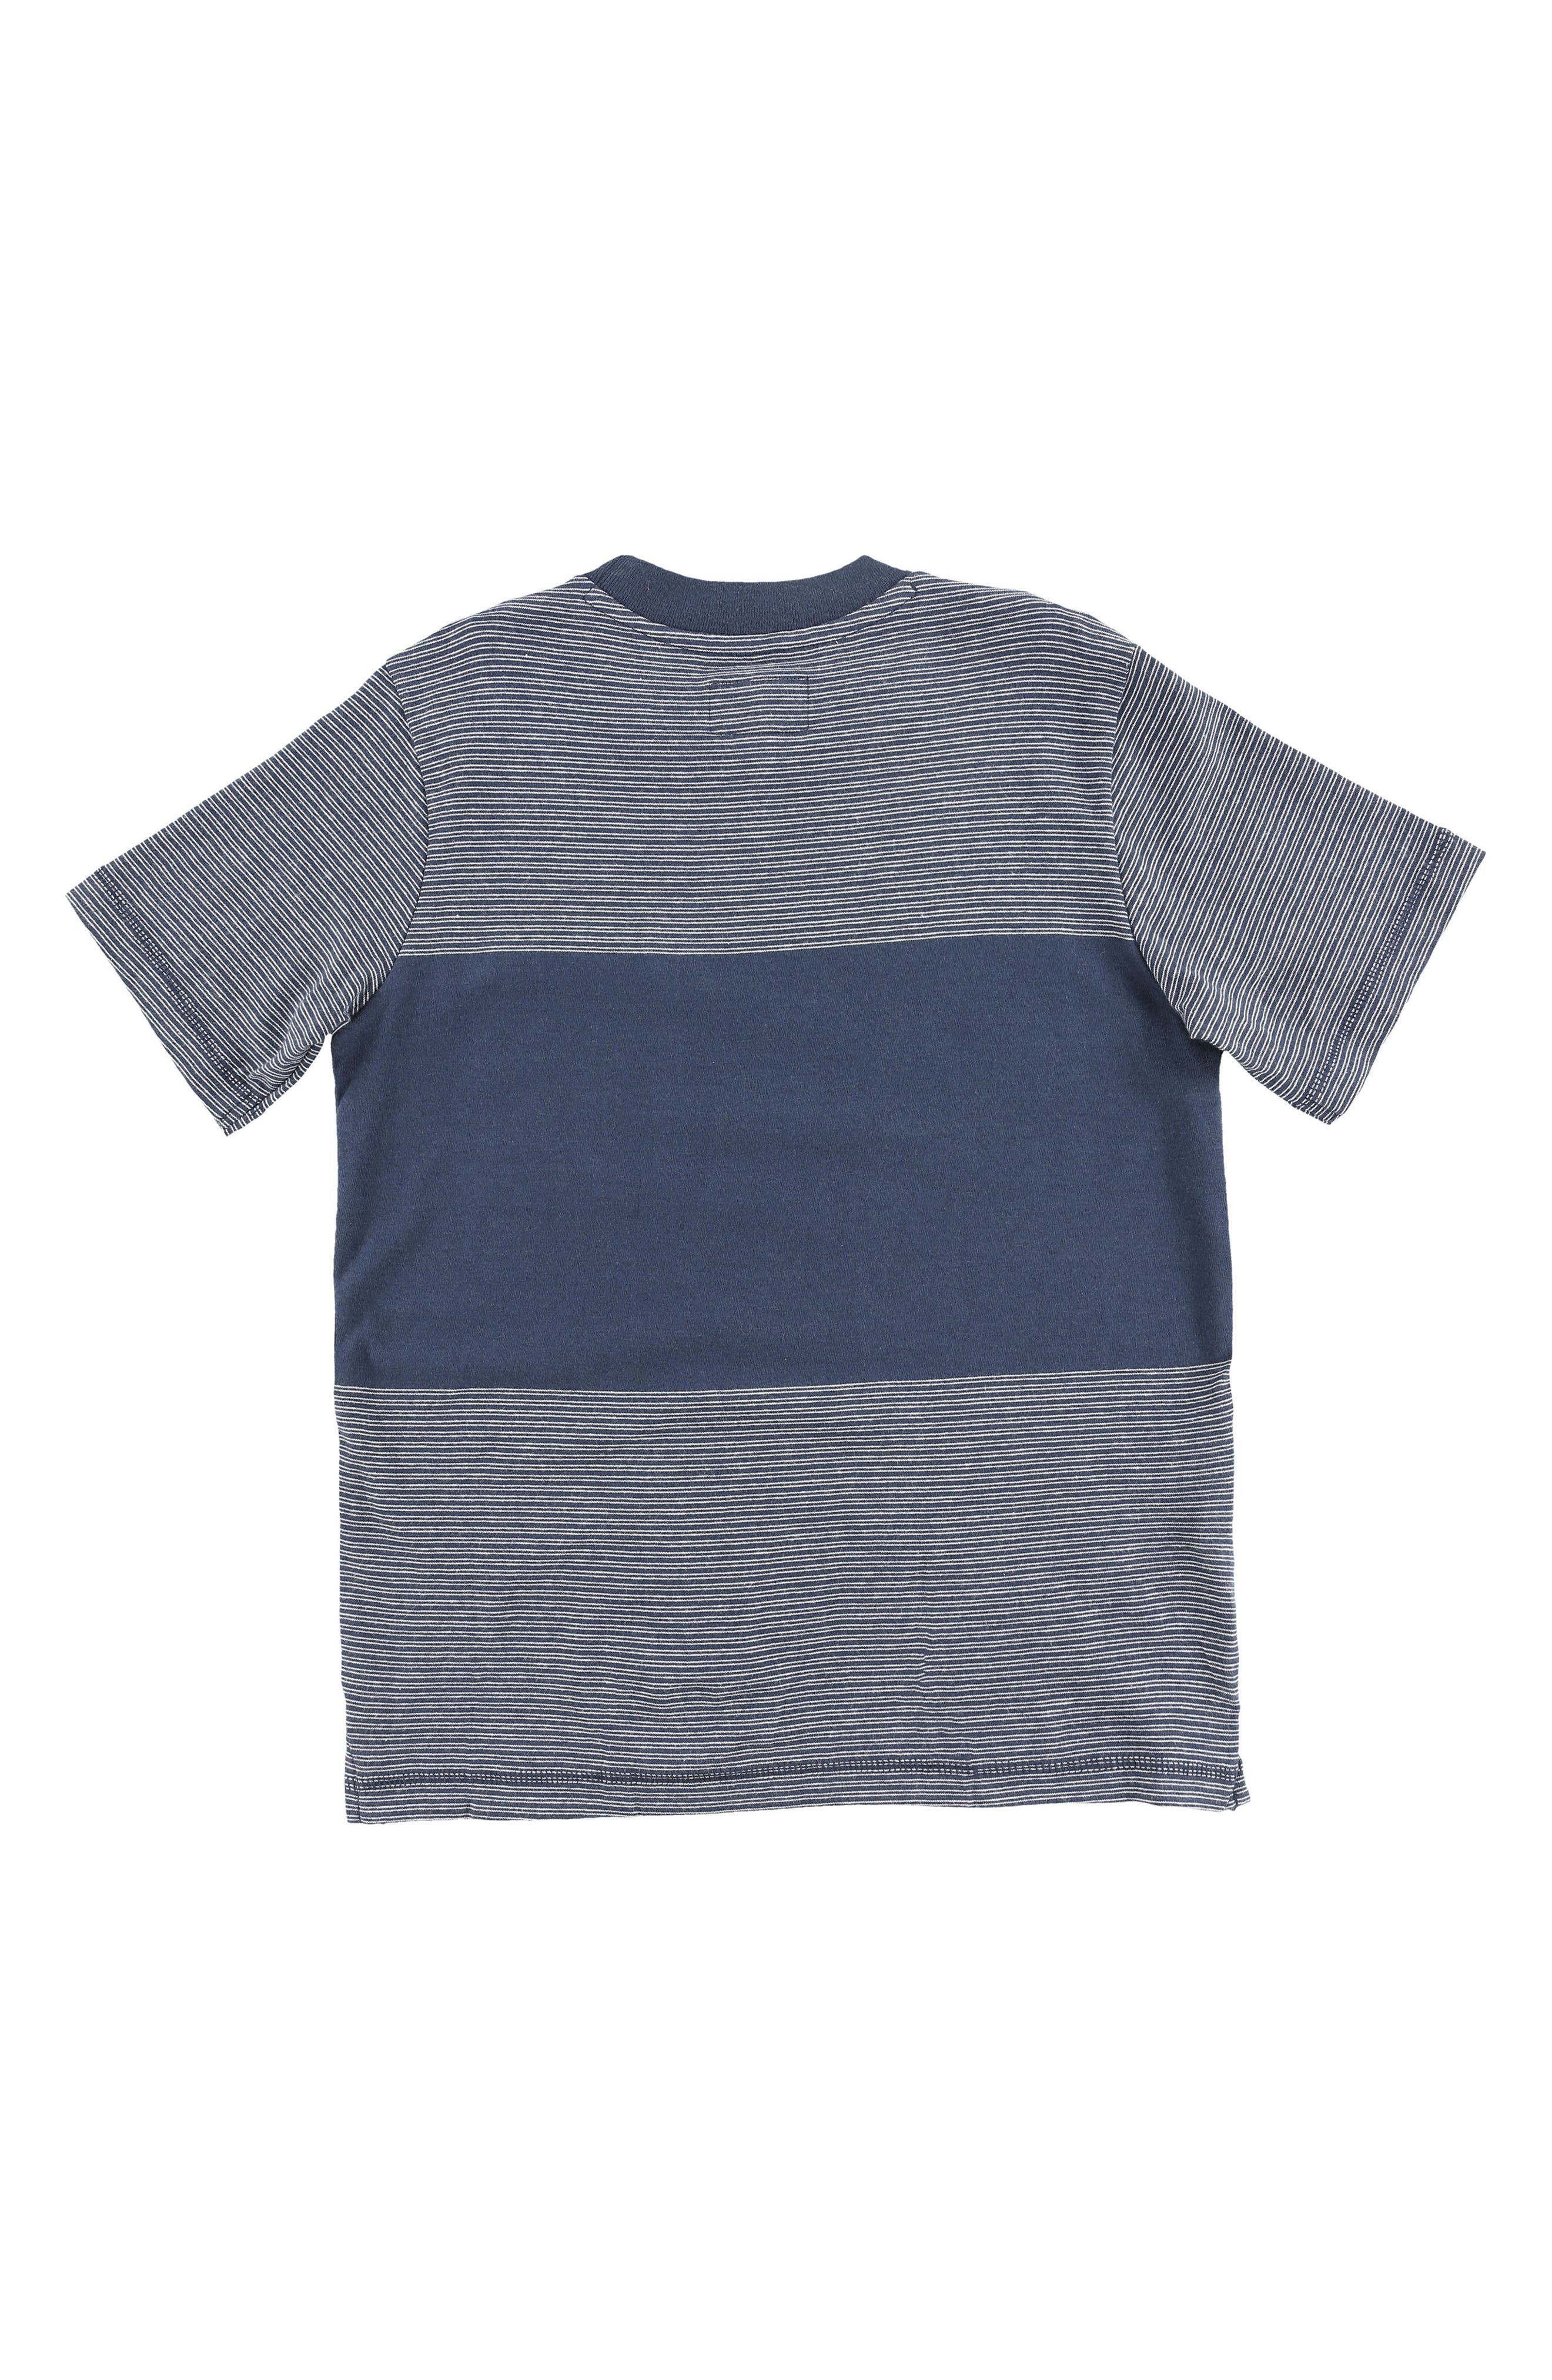 Bernardo T-Shirt,                             Alternate thumbnail 2, color,                             410